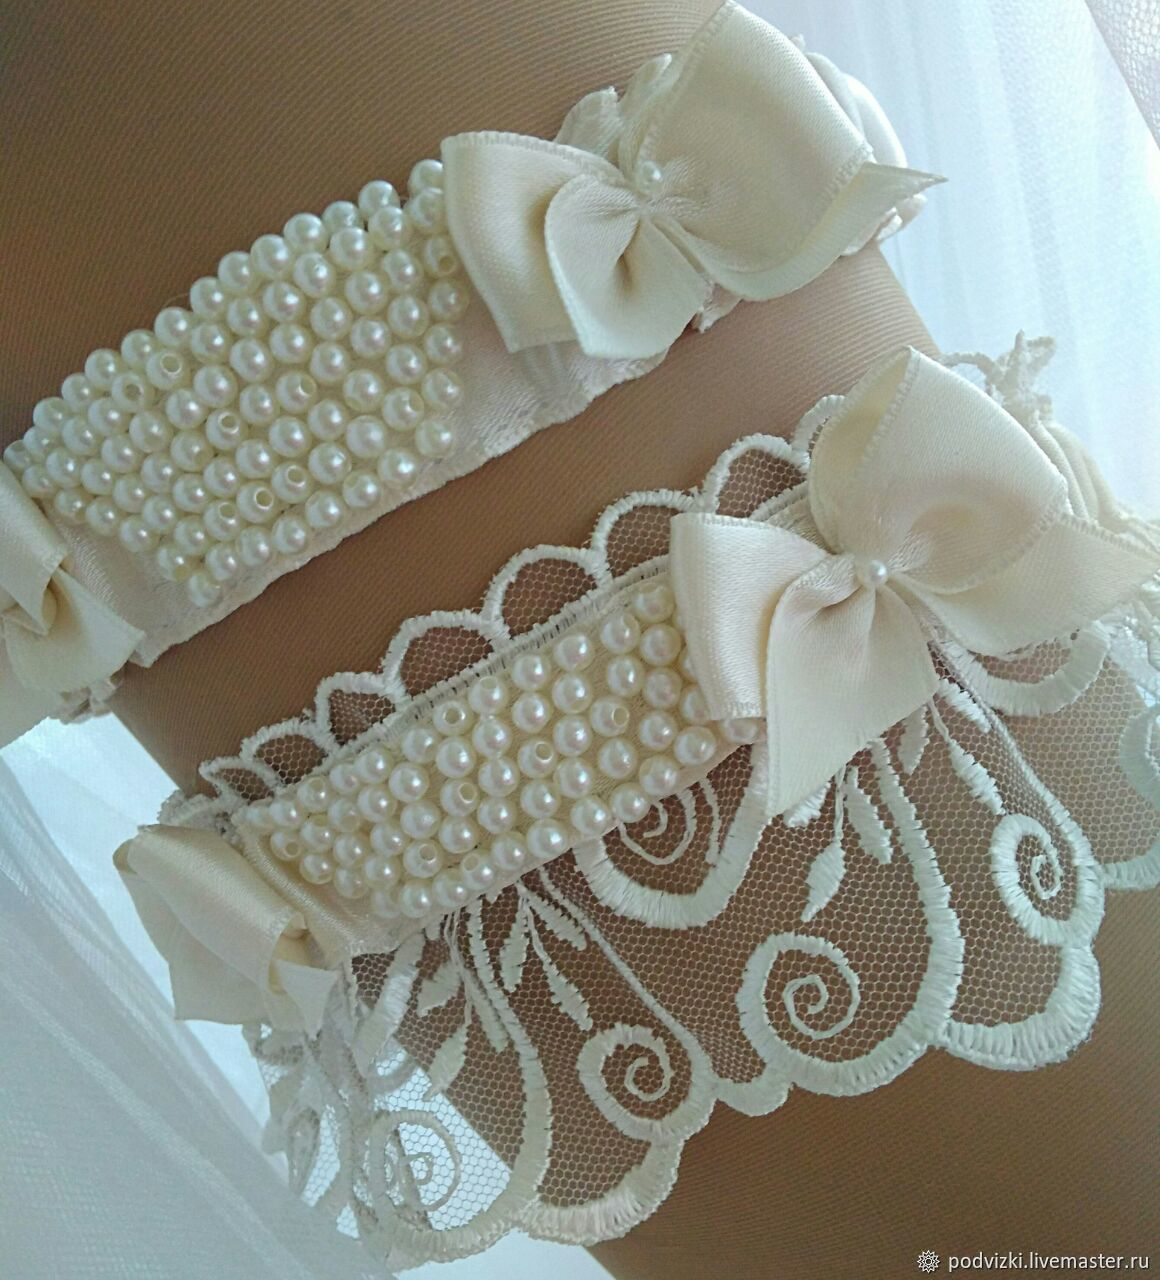 0209d5502 Clothing   Accessories handmade. Livemaster - handmade. Buy Garter for wedding  bride  emerald ...